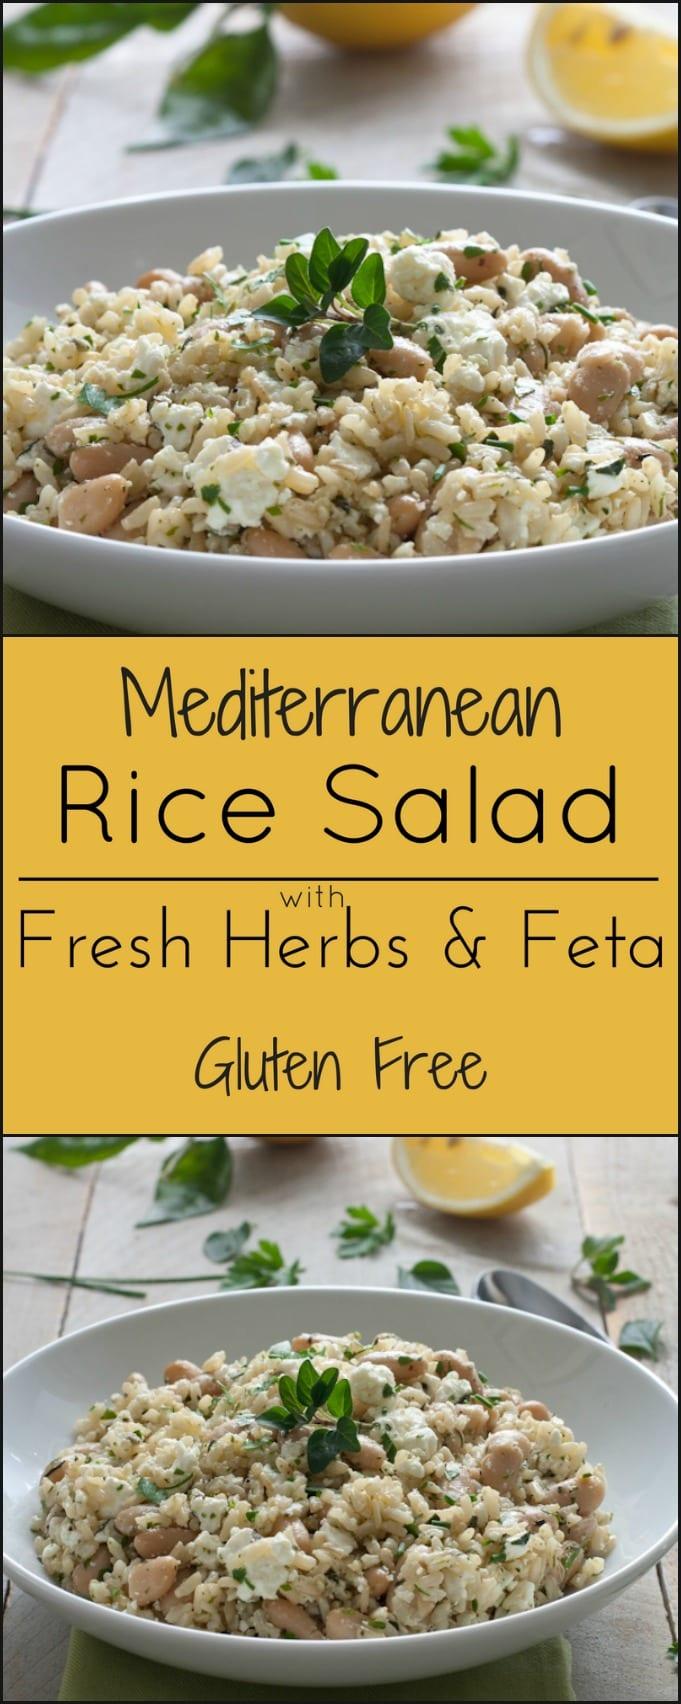 Gluten free summer side dish, Mediterranean Rice Salad with Feta and Fresh herbs.